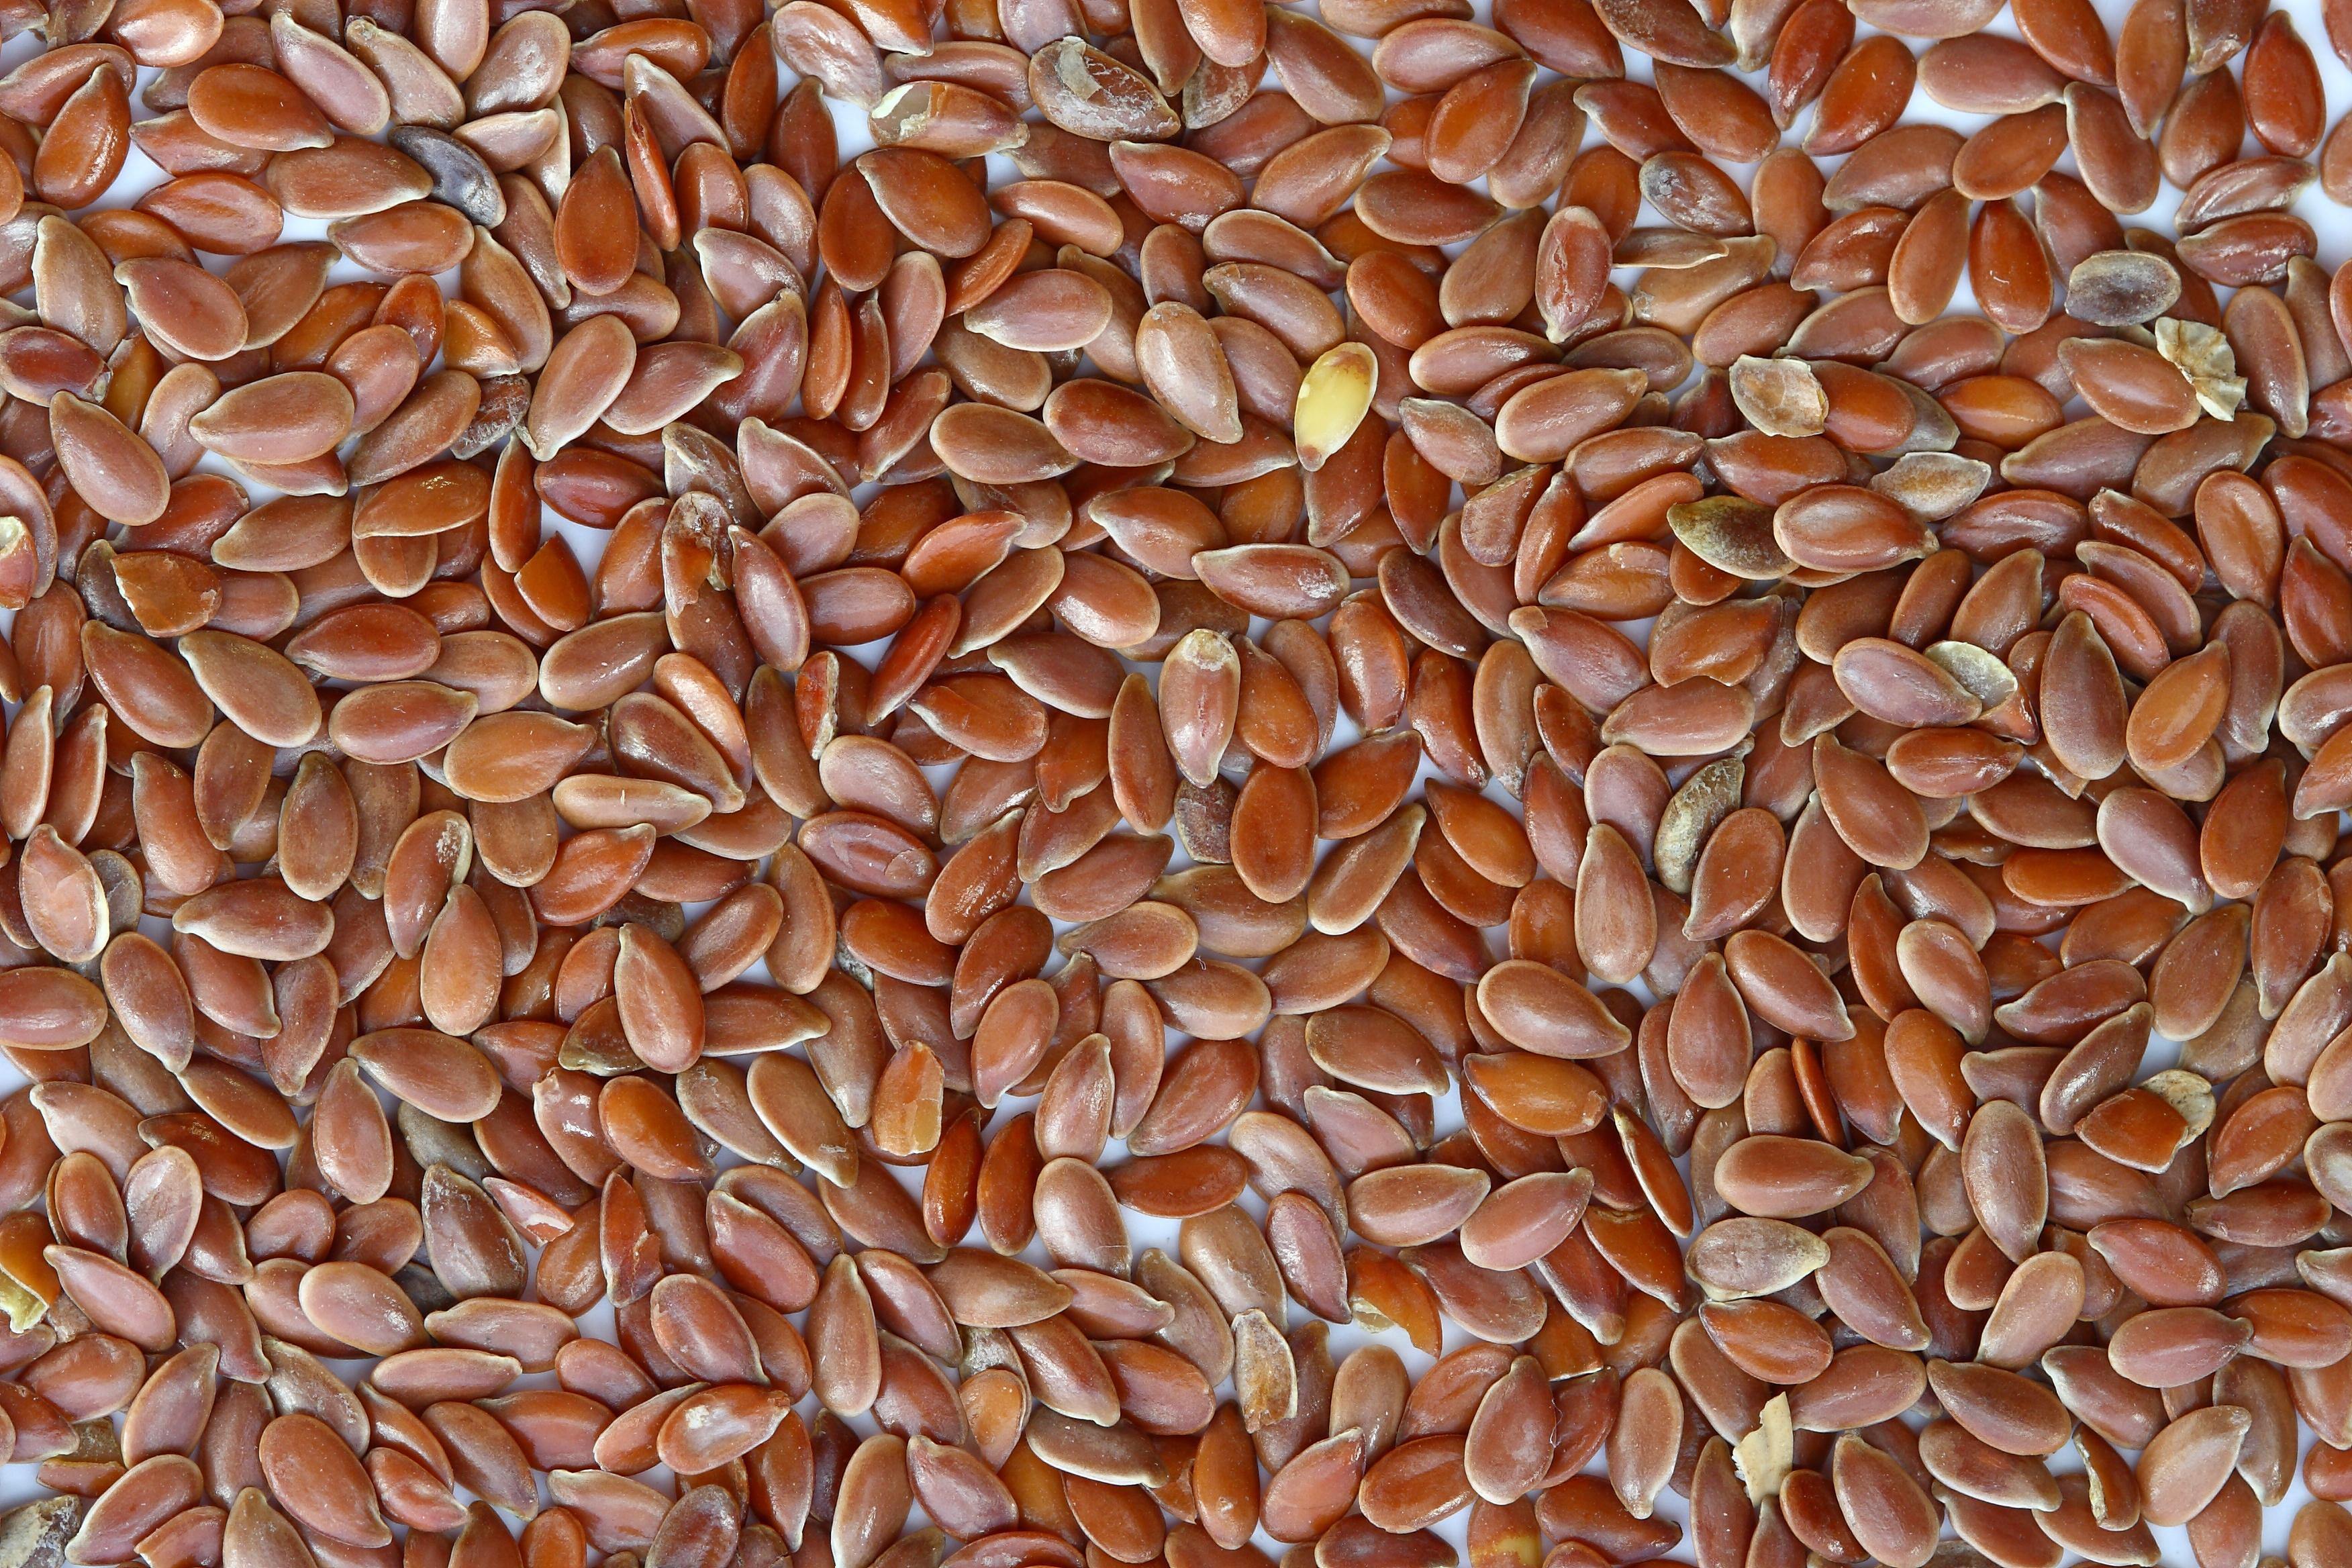 Seeds photo